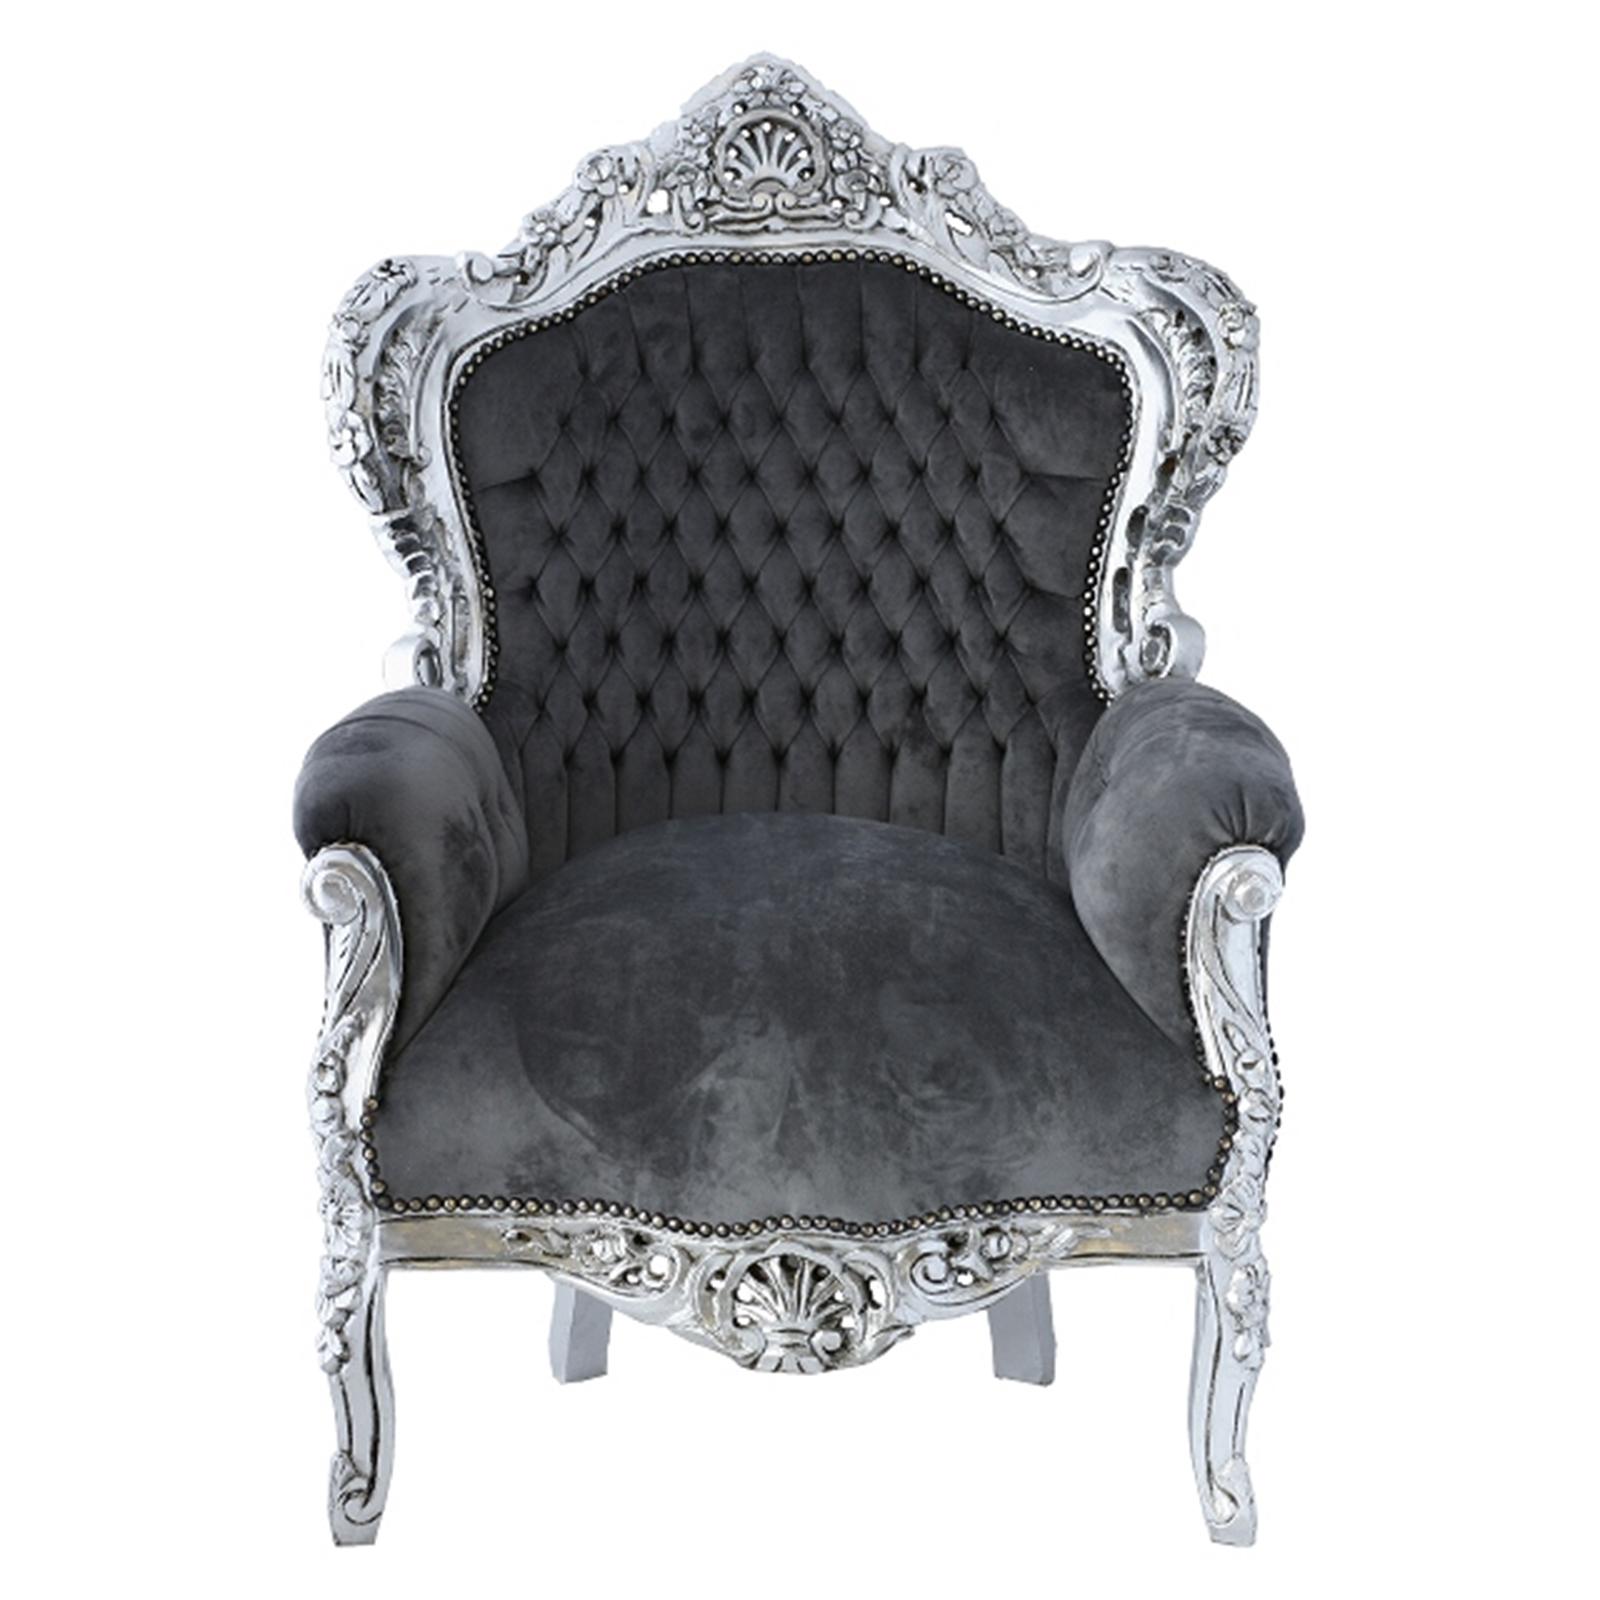 sessel klassiker in grau und silber barocksessel antik. Black Bedroom Furniture Sets. Home Design Ideas